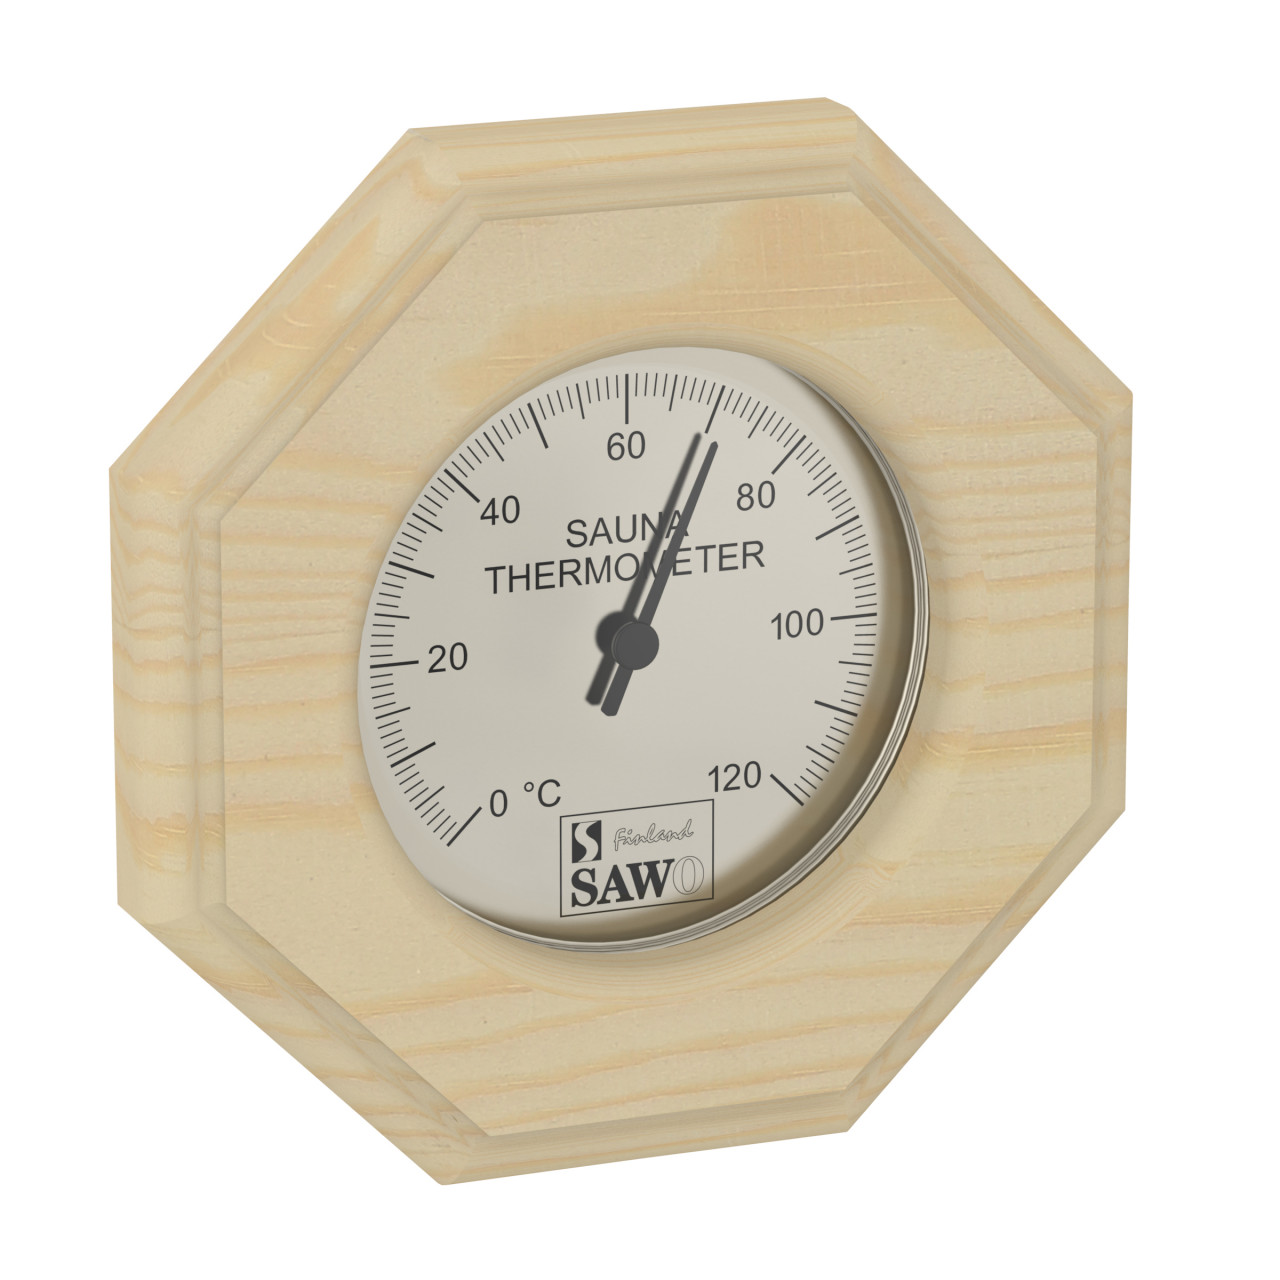 Sawo OCTOGOON thermometer